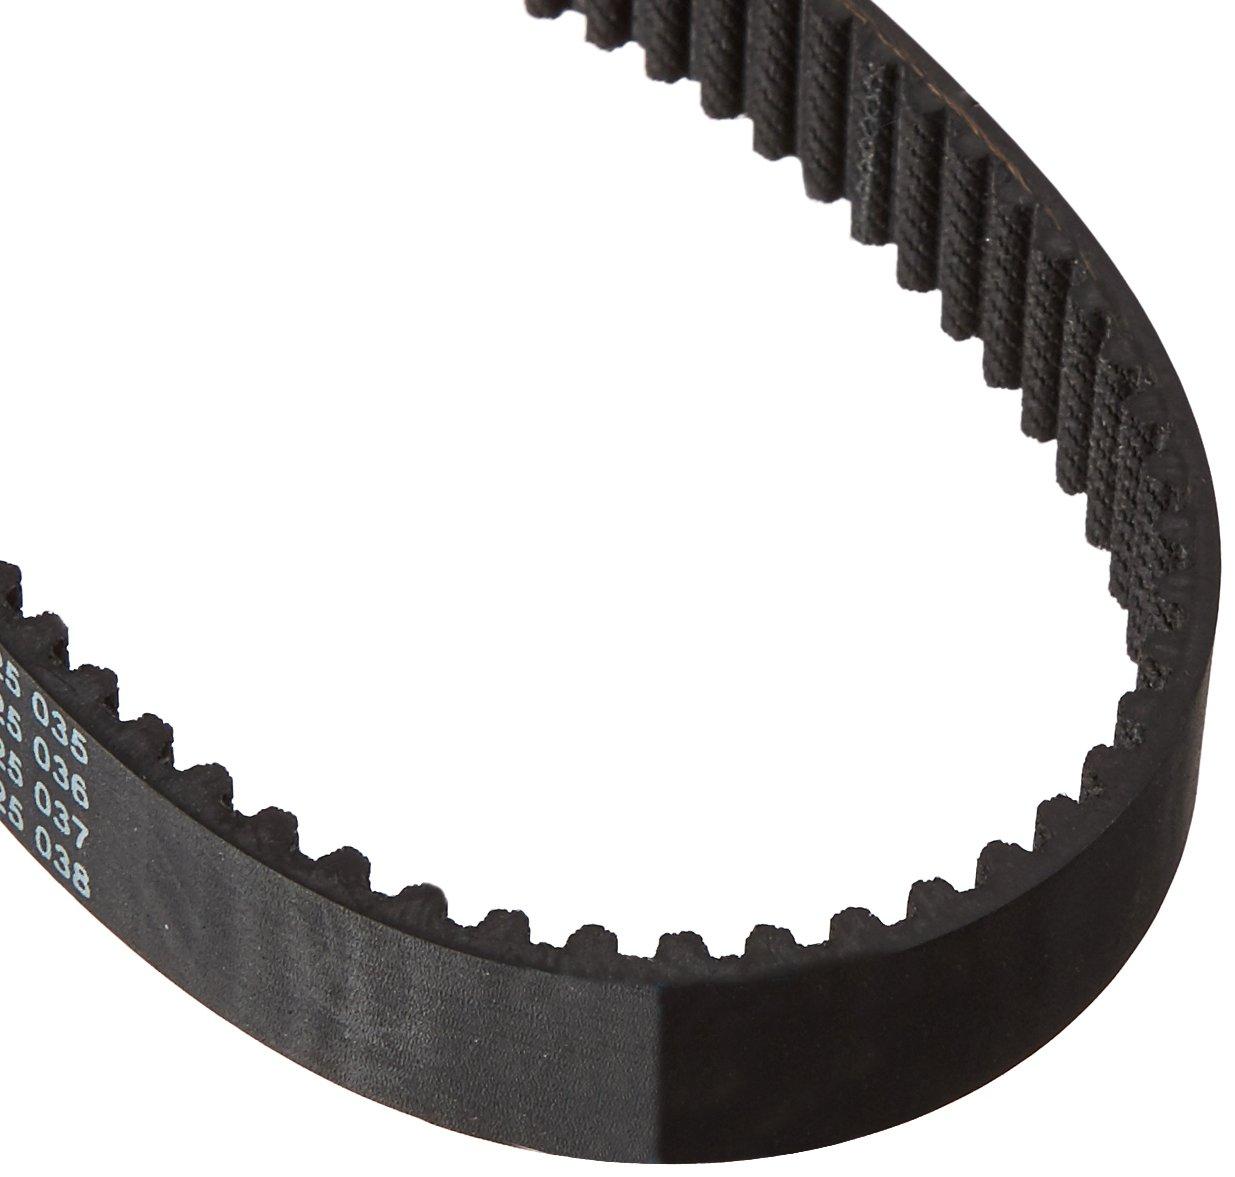 D/&D PowerDrive 610-5M-18 Timing Belt